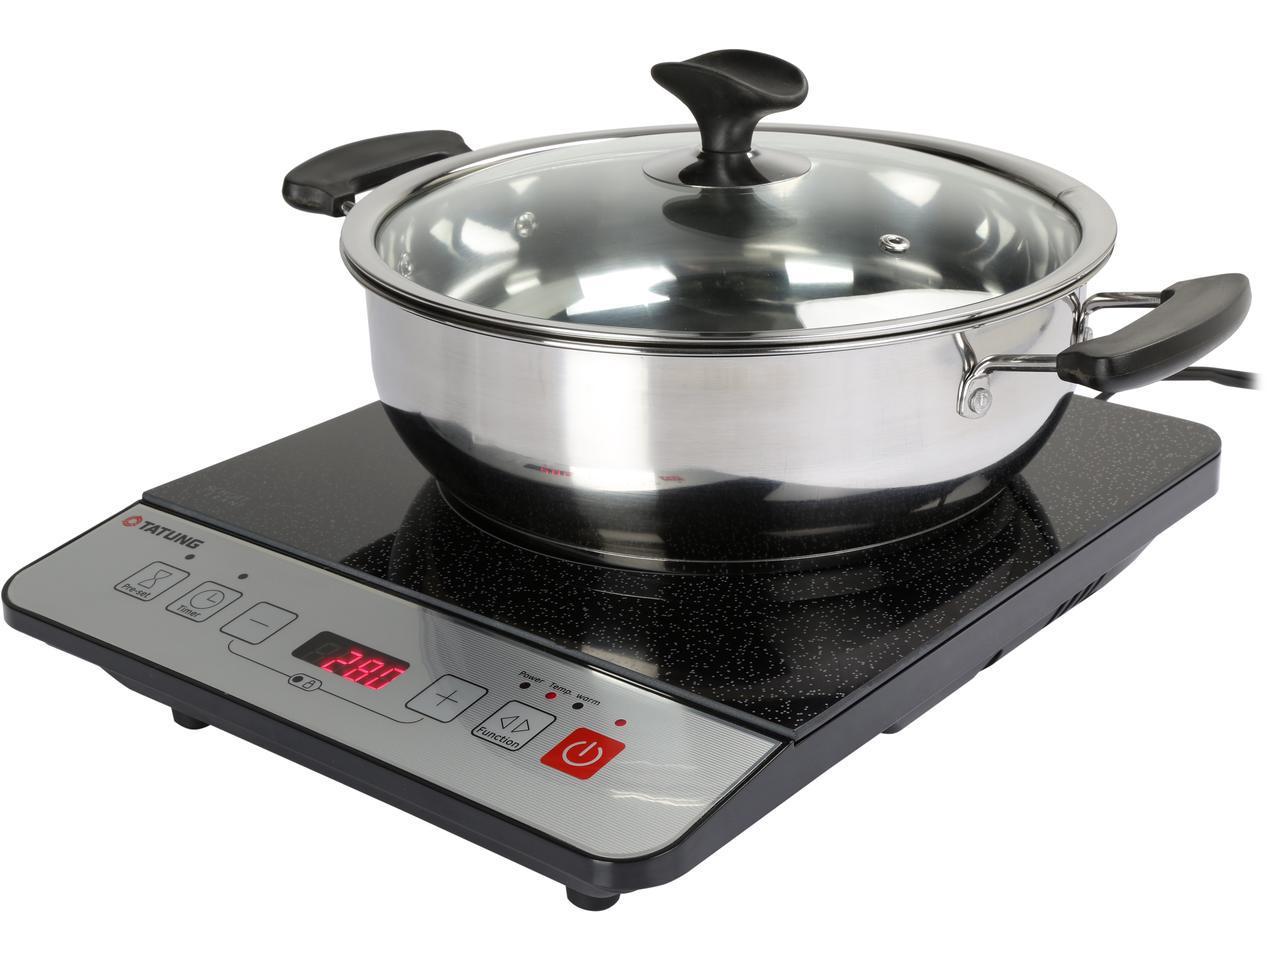 TATUNG TICT-1506MW Induction Cooker $49.99